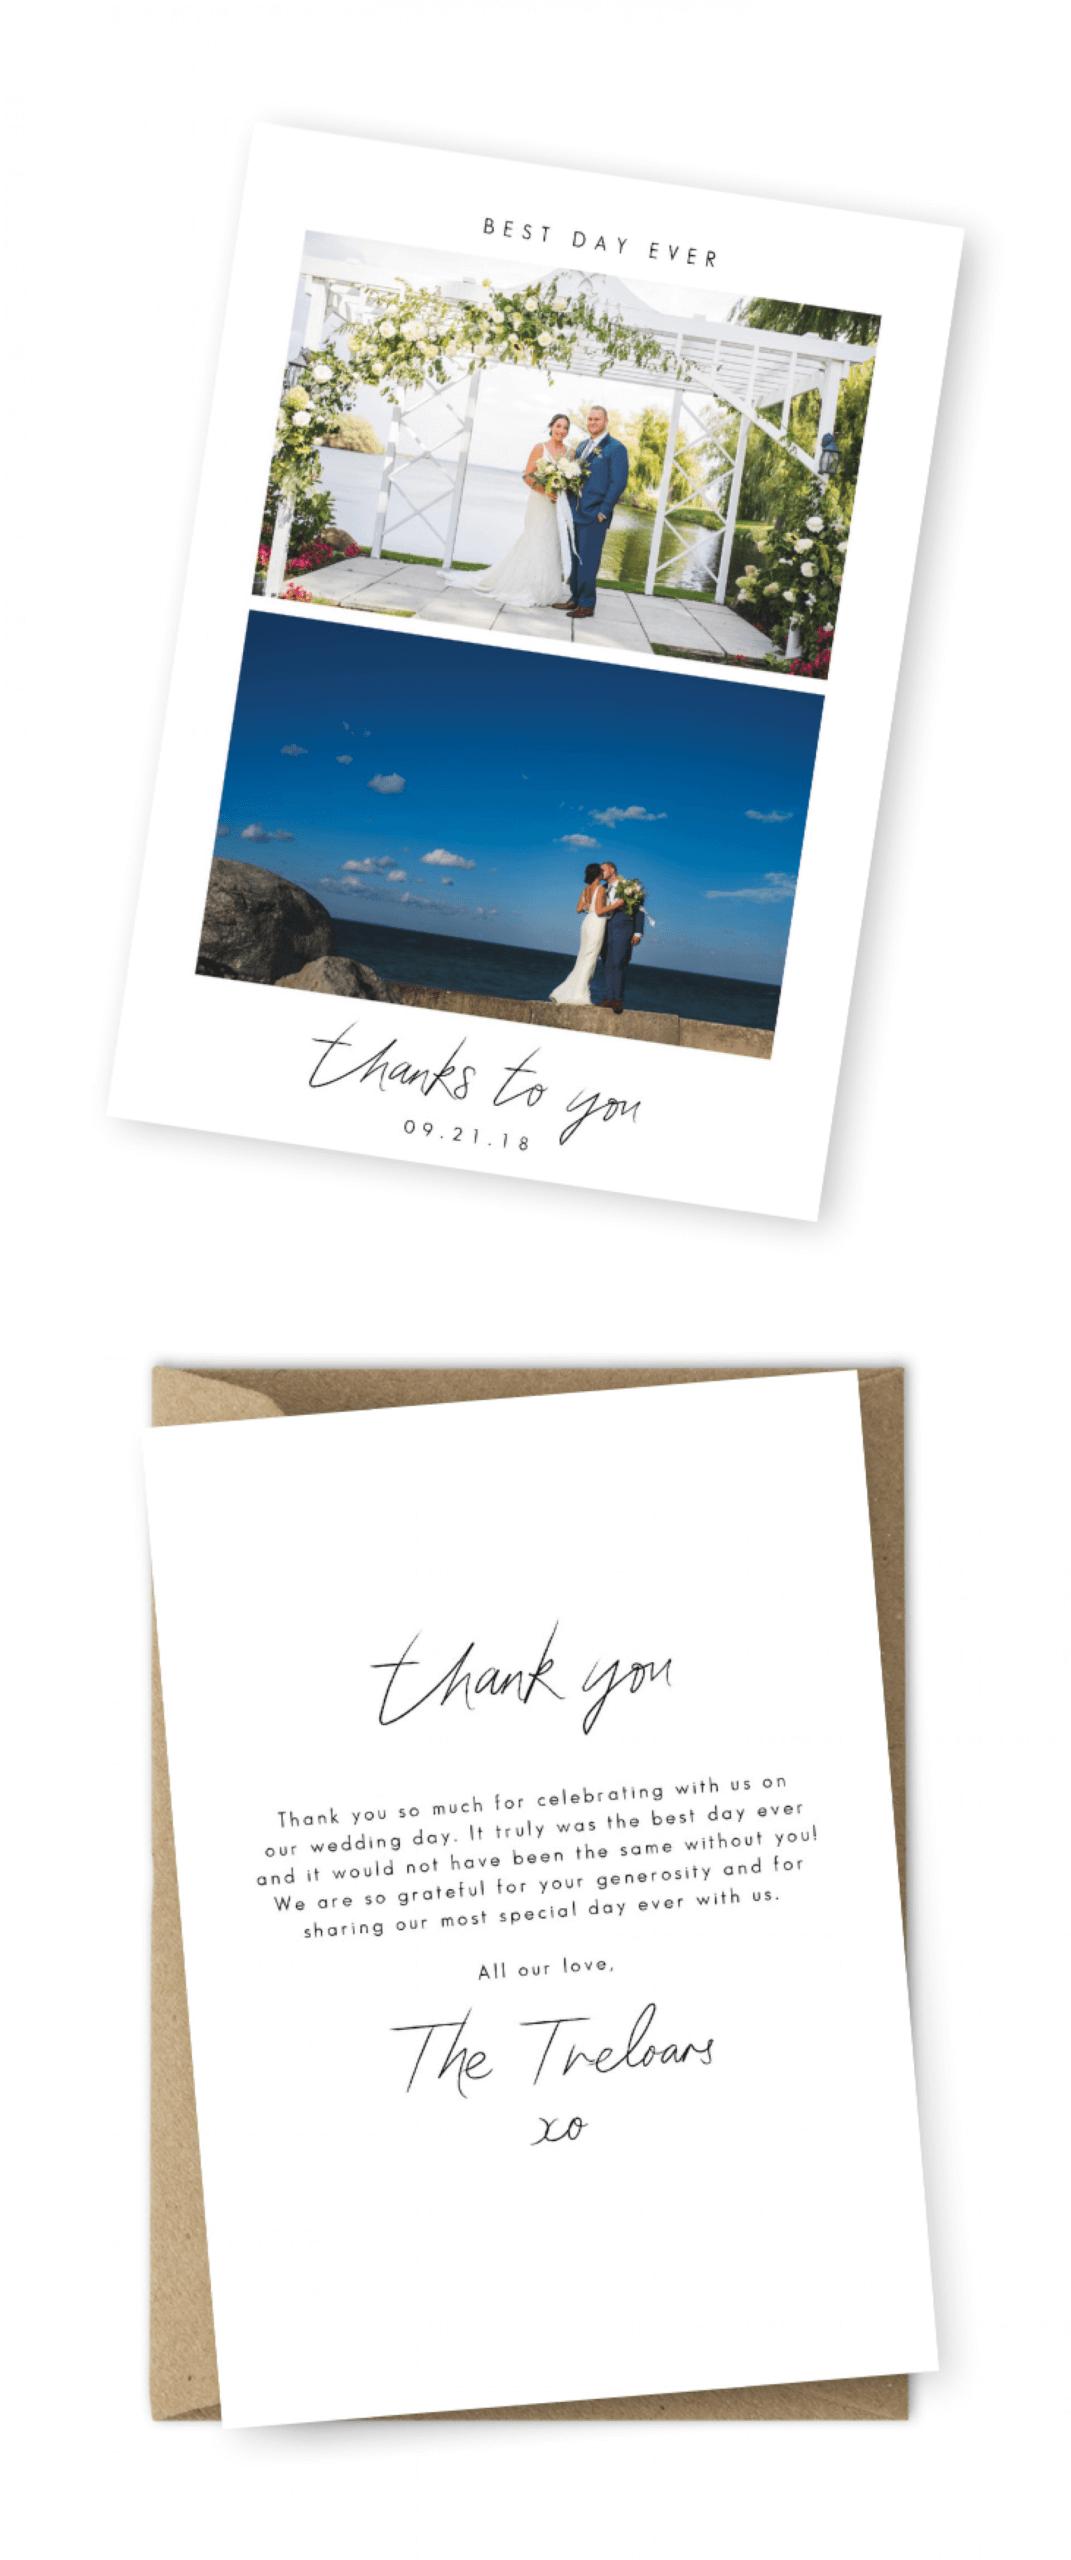 005 Wedding Thank You Card Wording Message Ideas Template Regarding Template For Wedding Thank You Cards